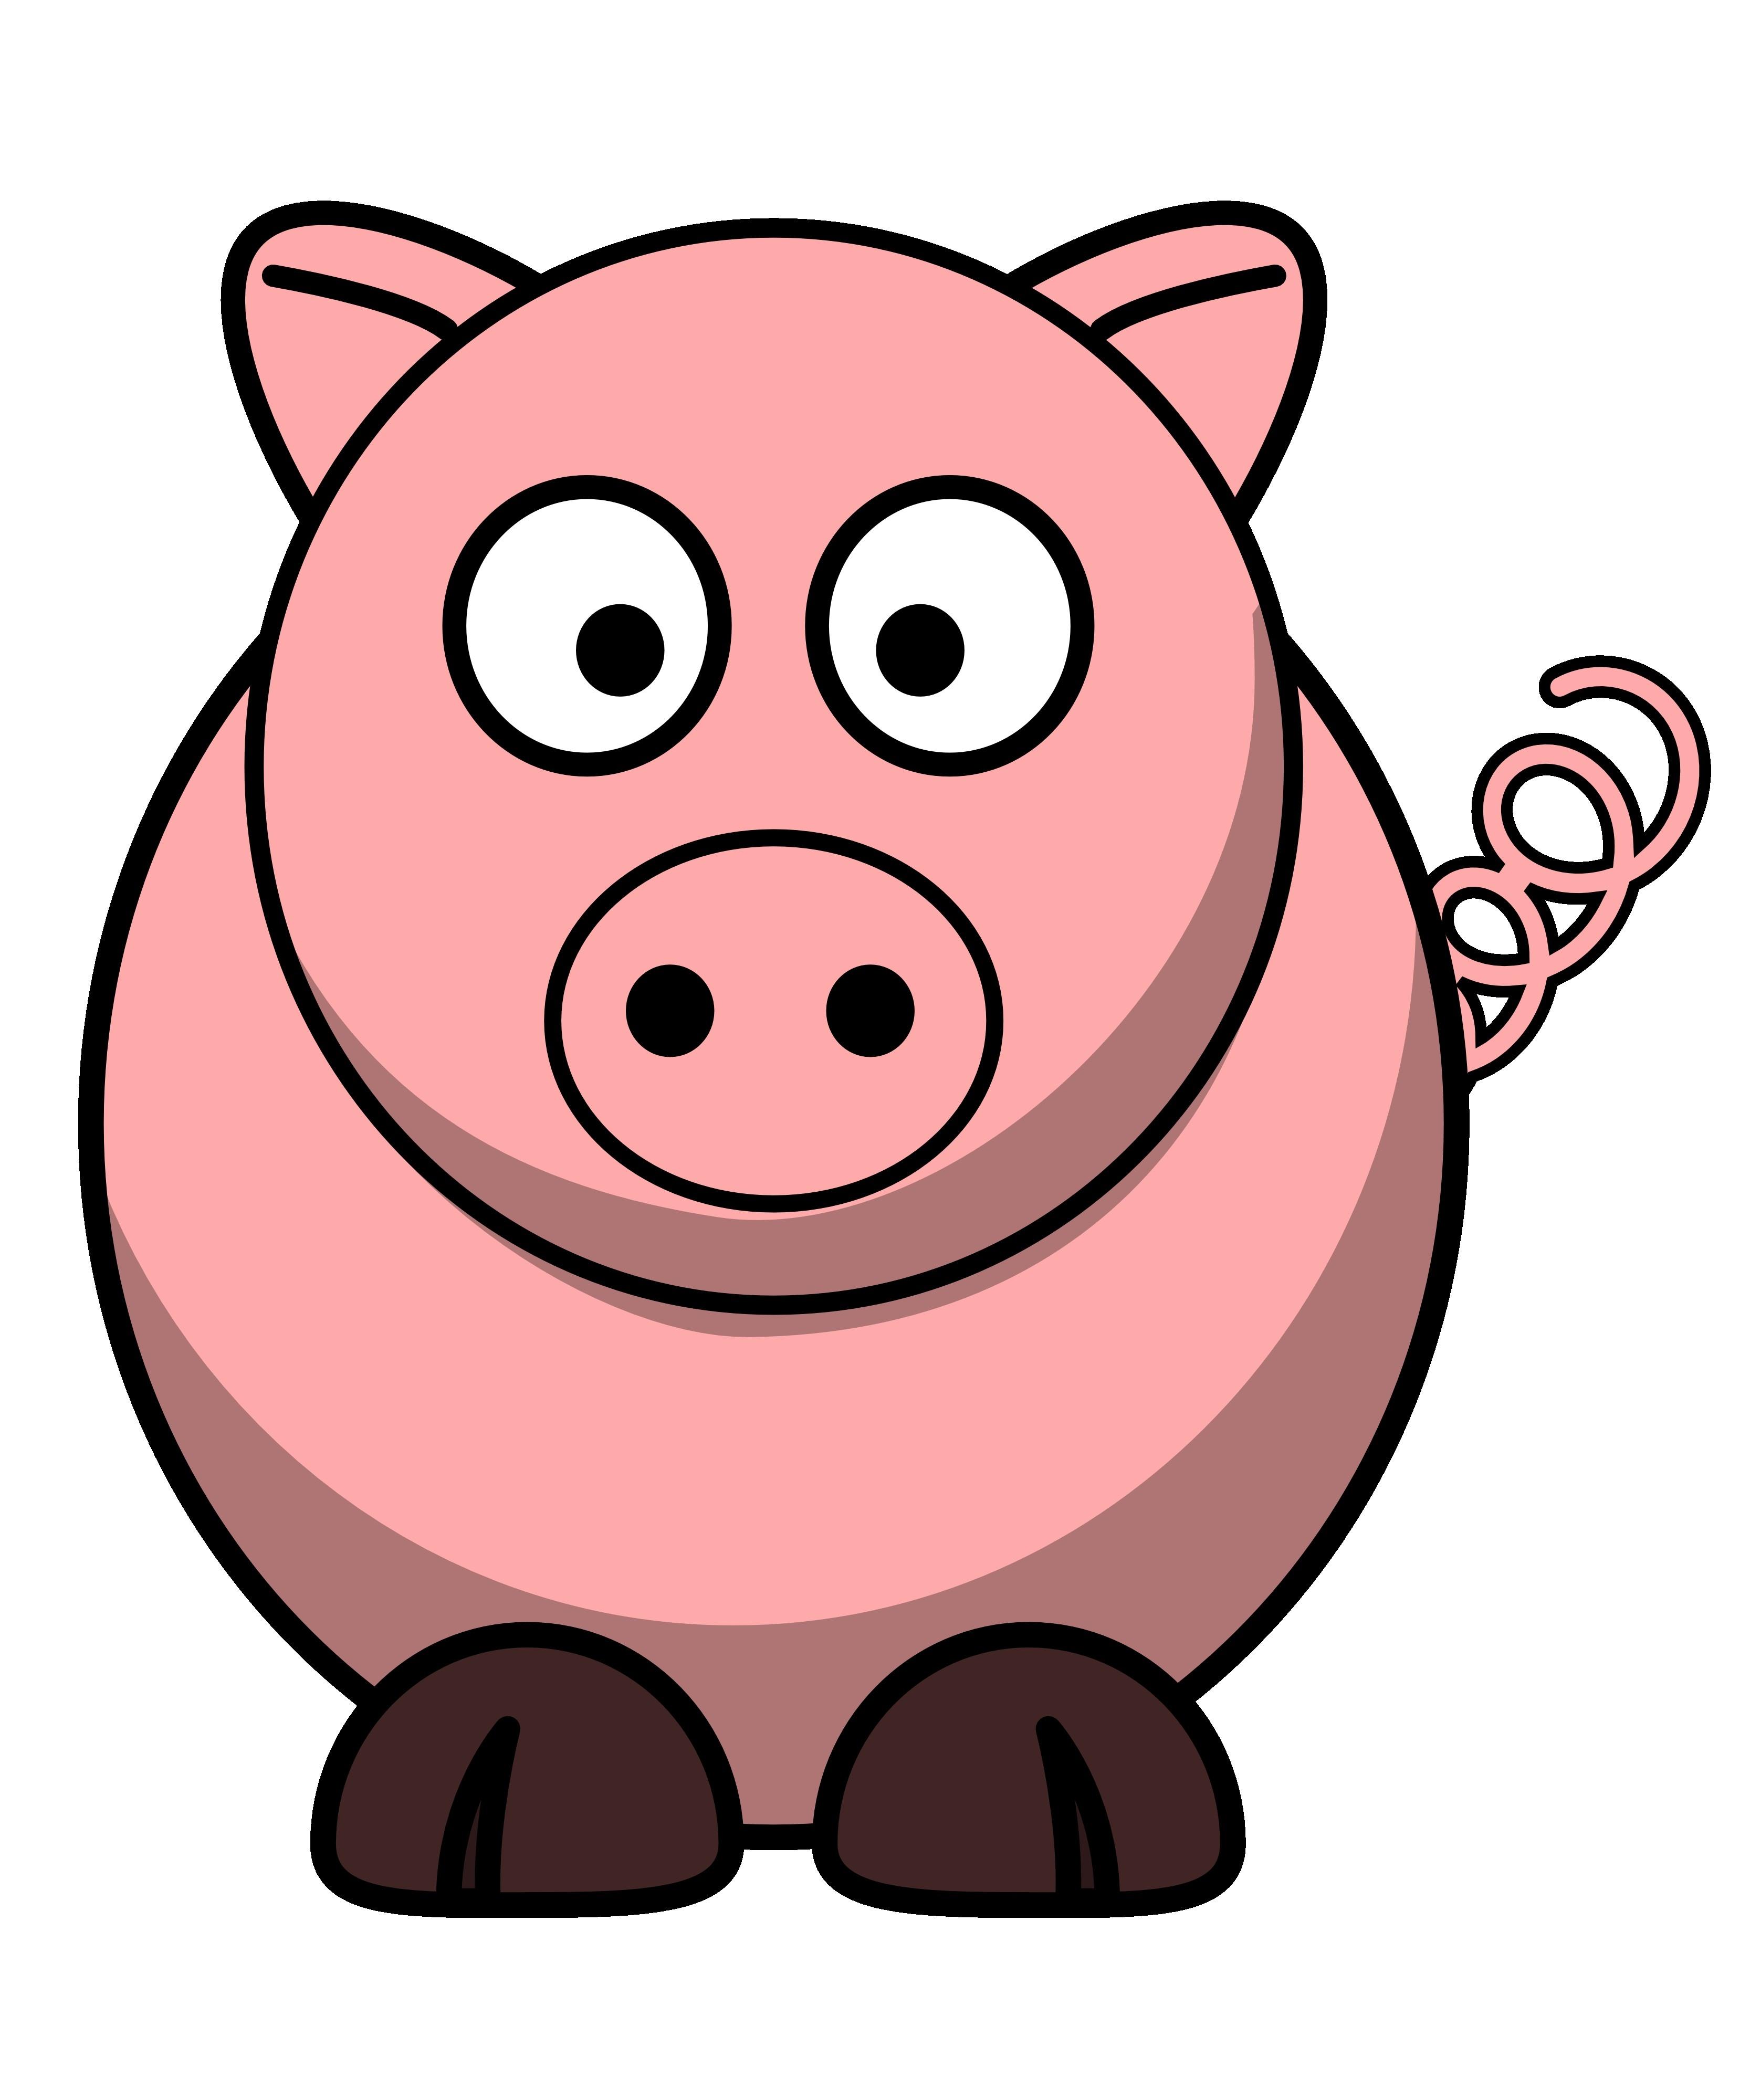 cute baby pig clipart at getdrawings com free for personal use rh getdrawings com pig clip art free pig clip art free black and white